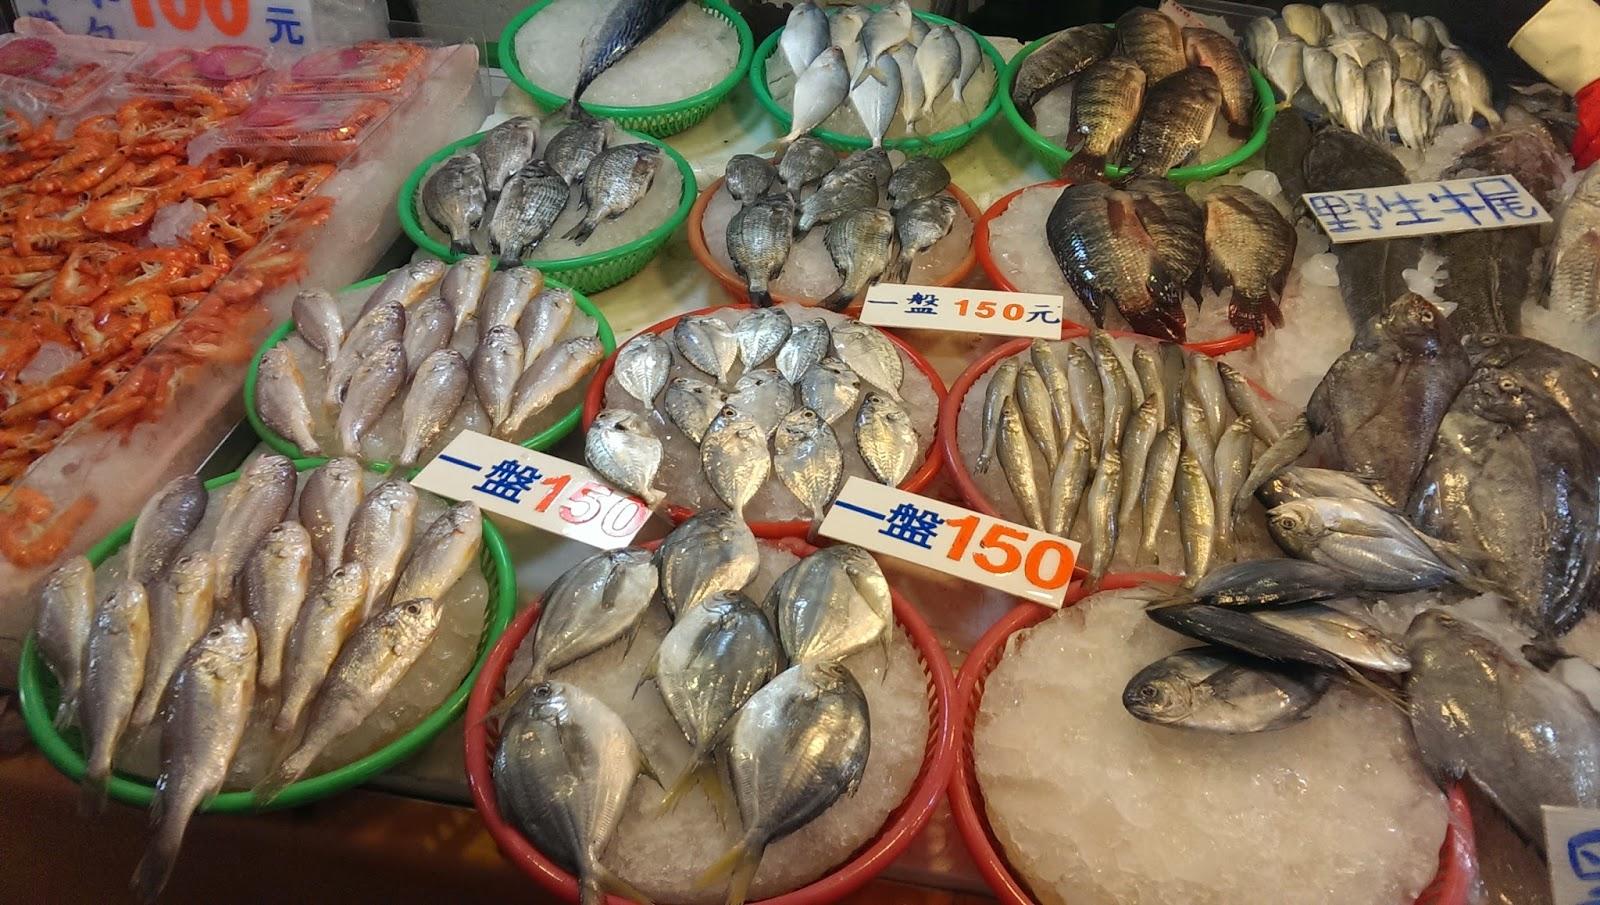 2015 02 02%2B12.59.09 - [食記] 葉家生魚片 - 布袋觀光漁市中的鮮魚餐廳